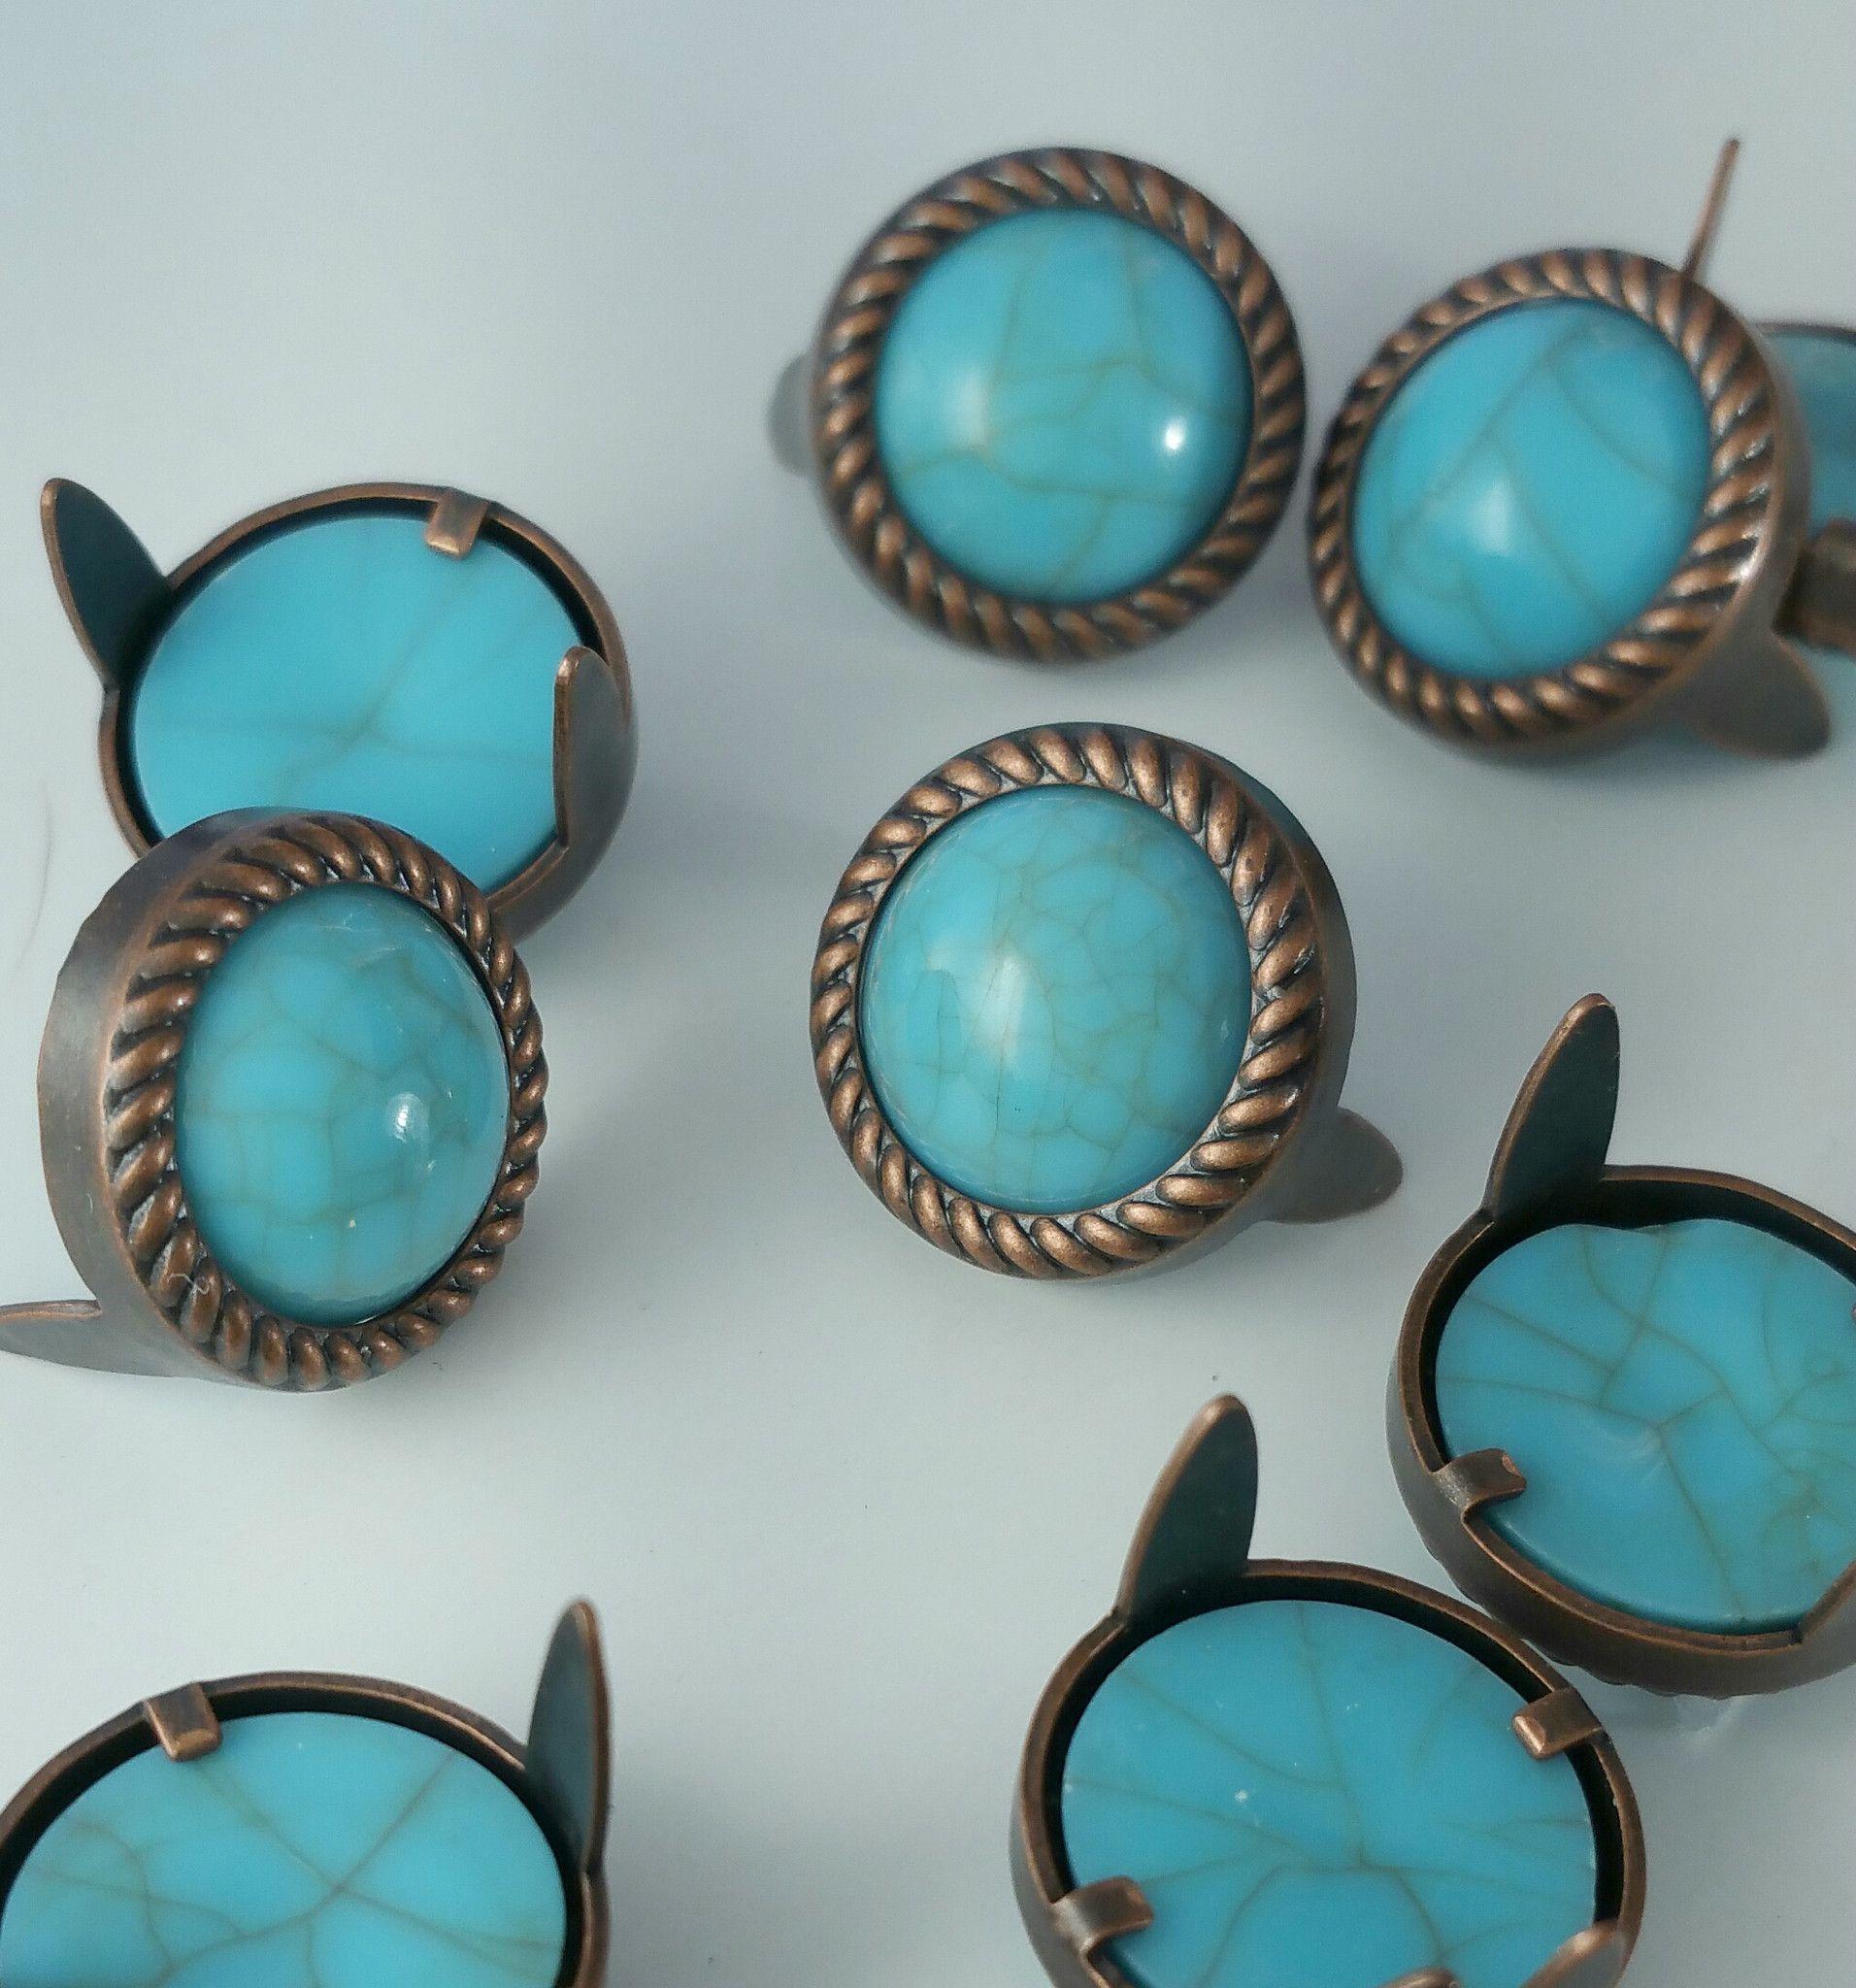 "7531-M06 1/2"" Rope Edge Turquoise Gemstones with Antique Copper Setting"